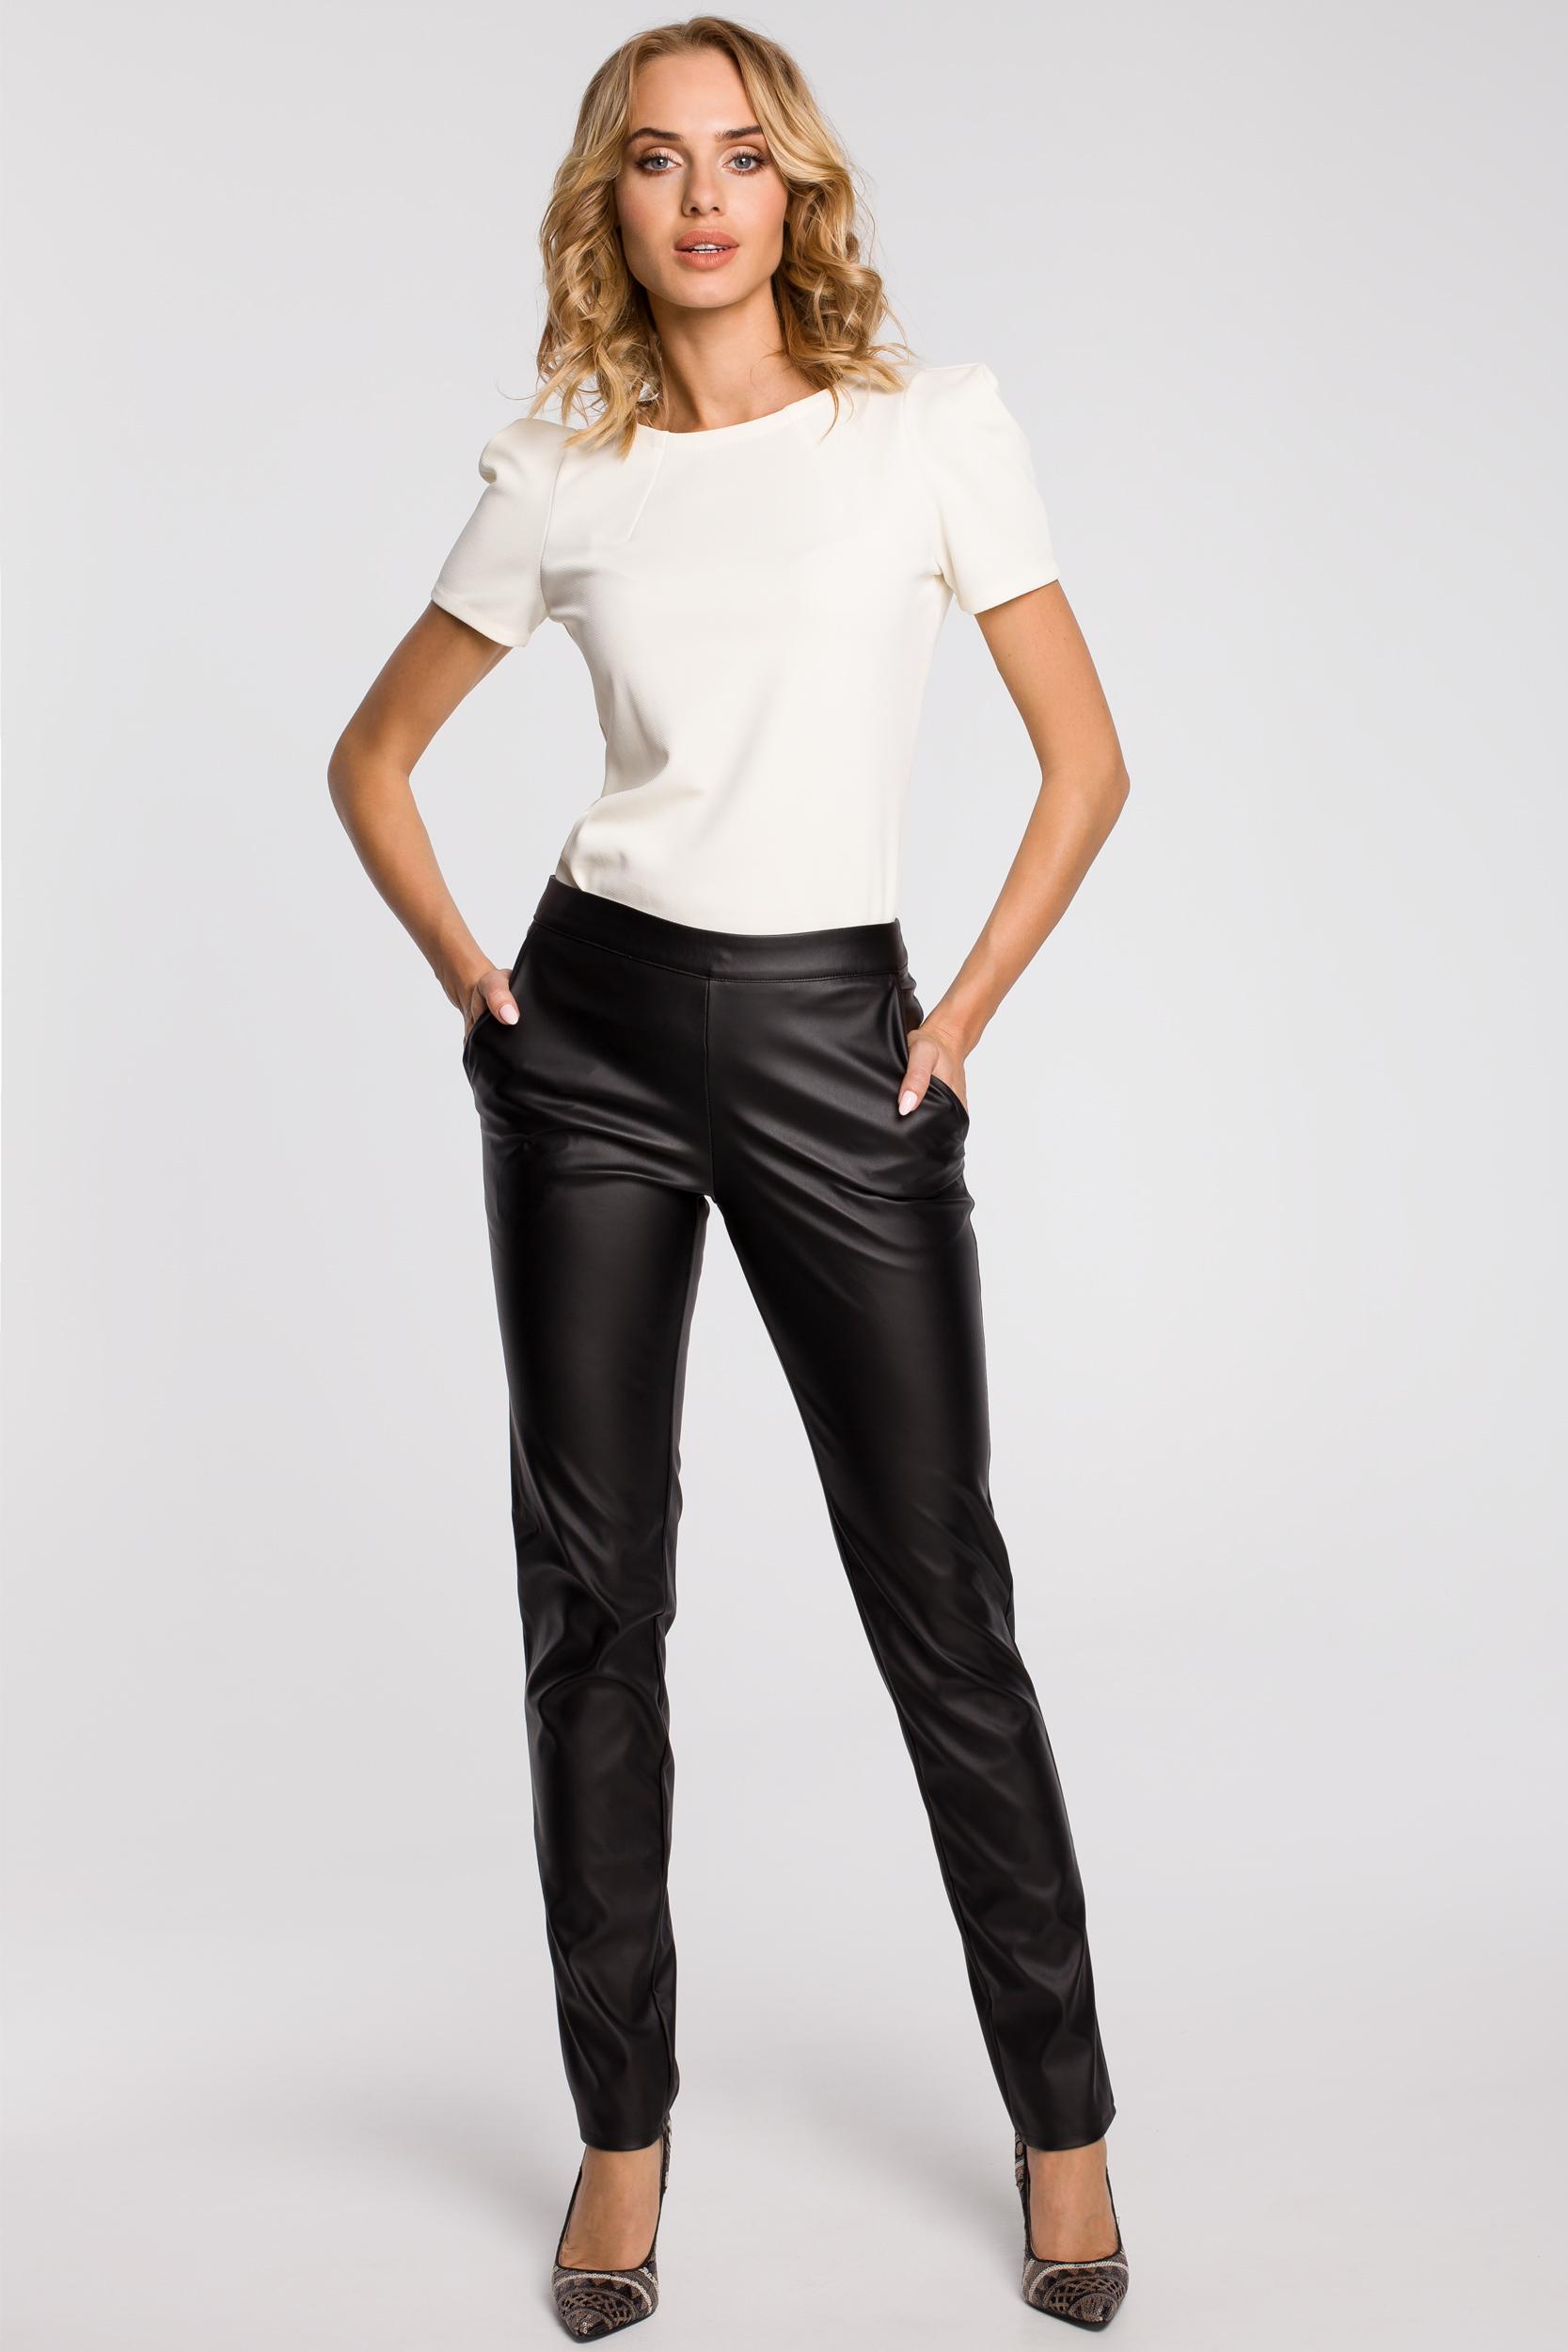 CM1187 Eleganckie spodnie damskie rurki z eko-skóry - czarne